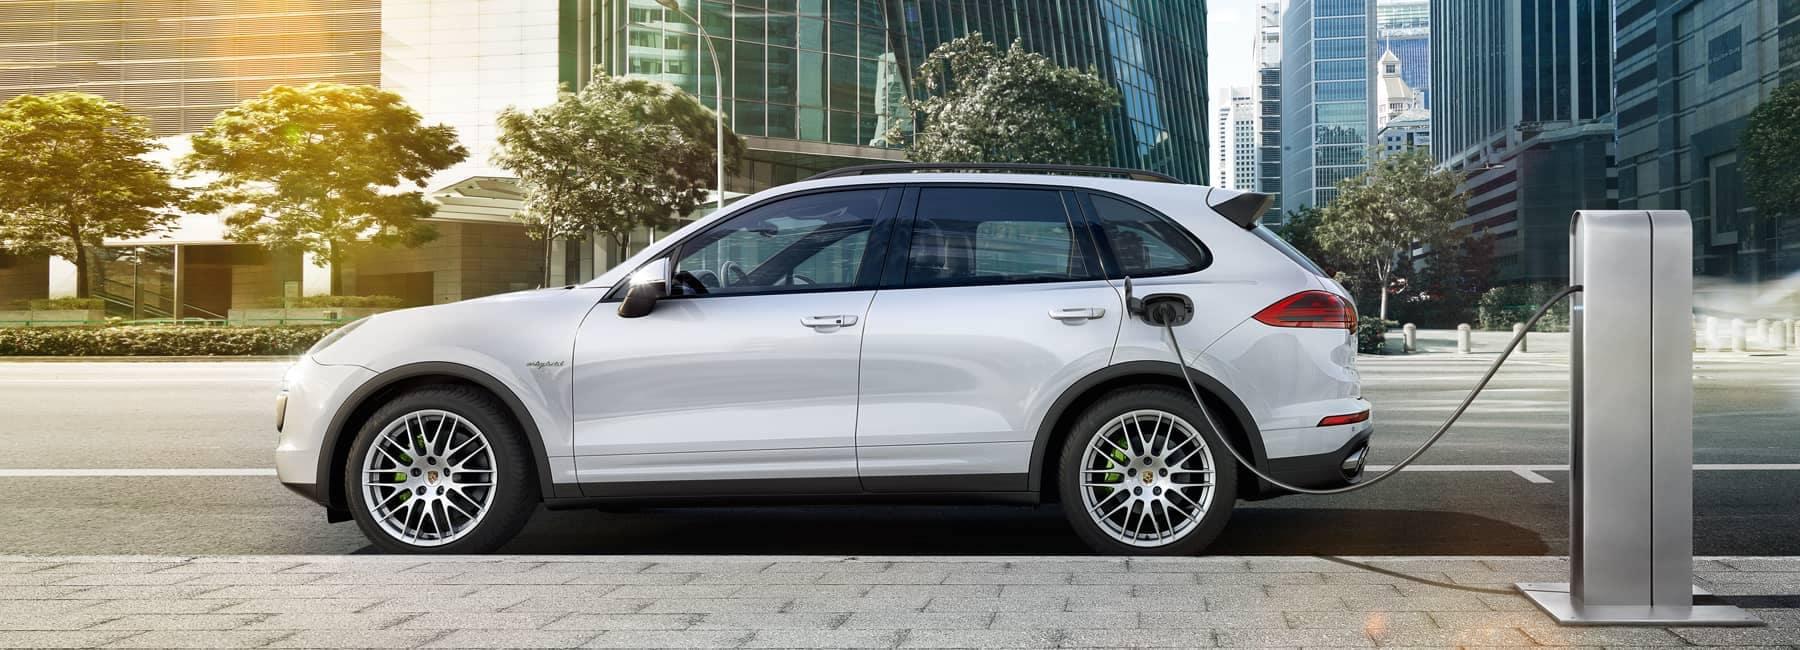 2018 Porsche Cayenne Model Review Specs Pricing Trims